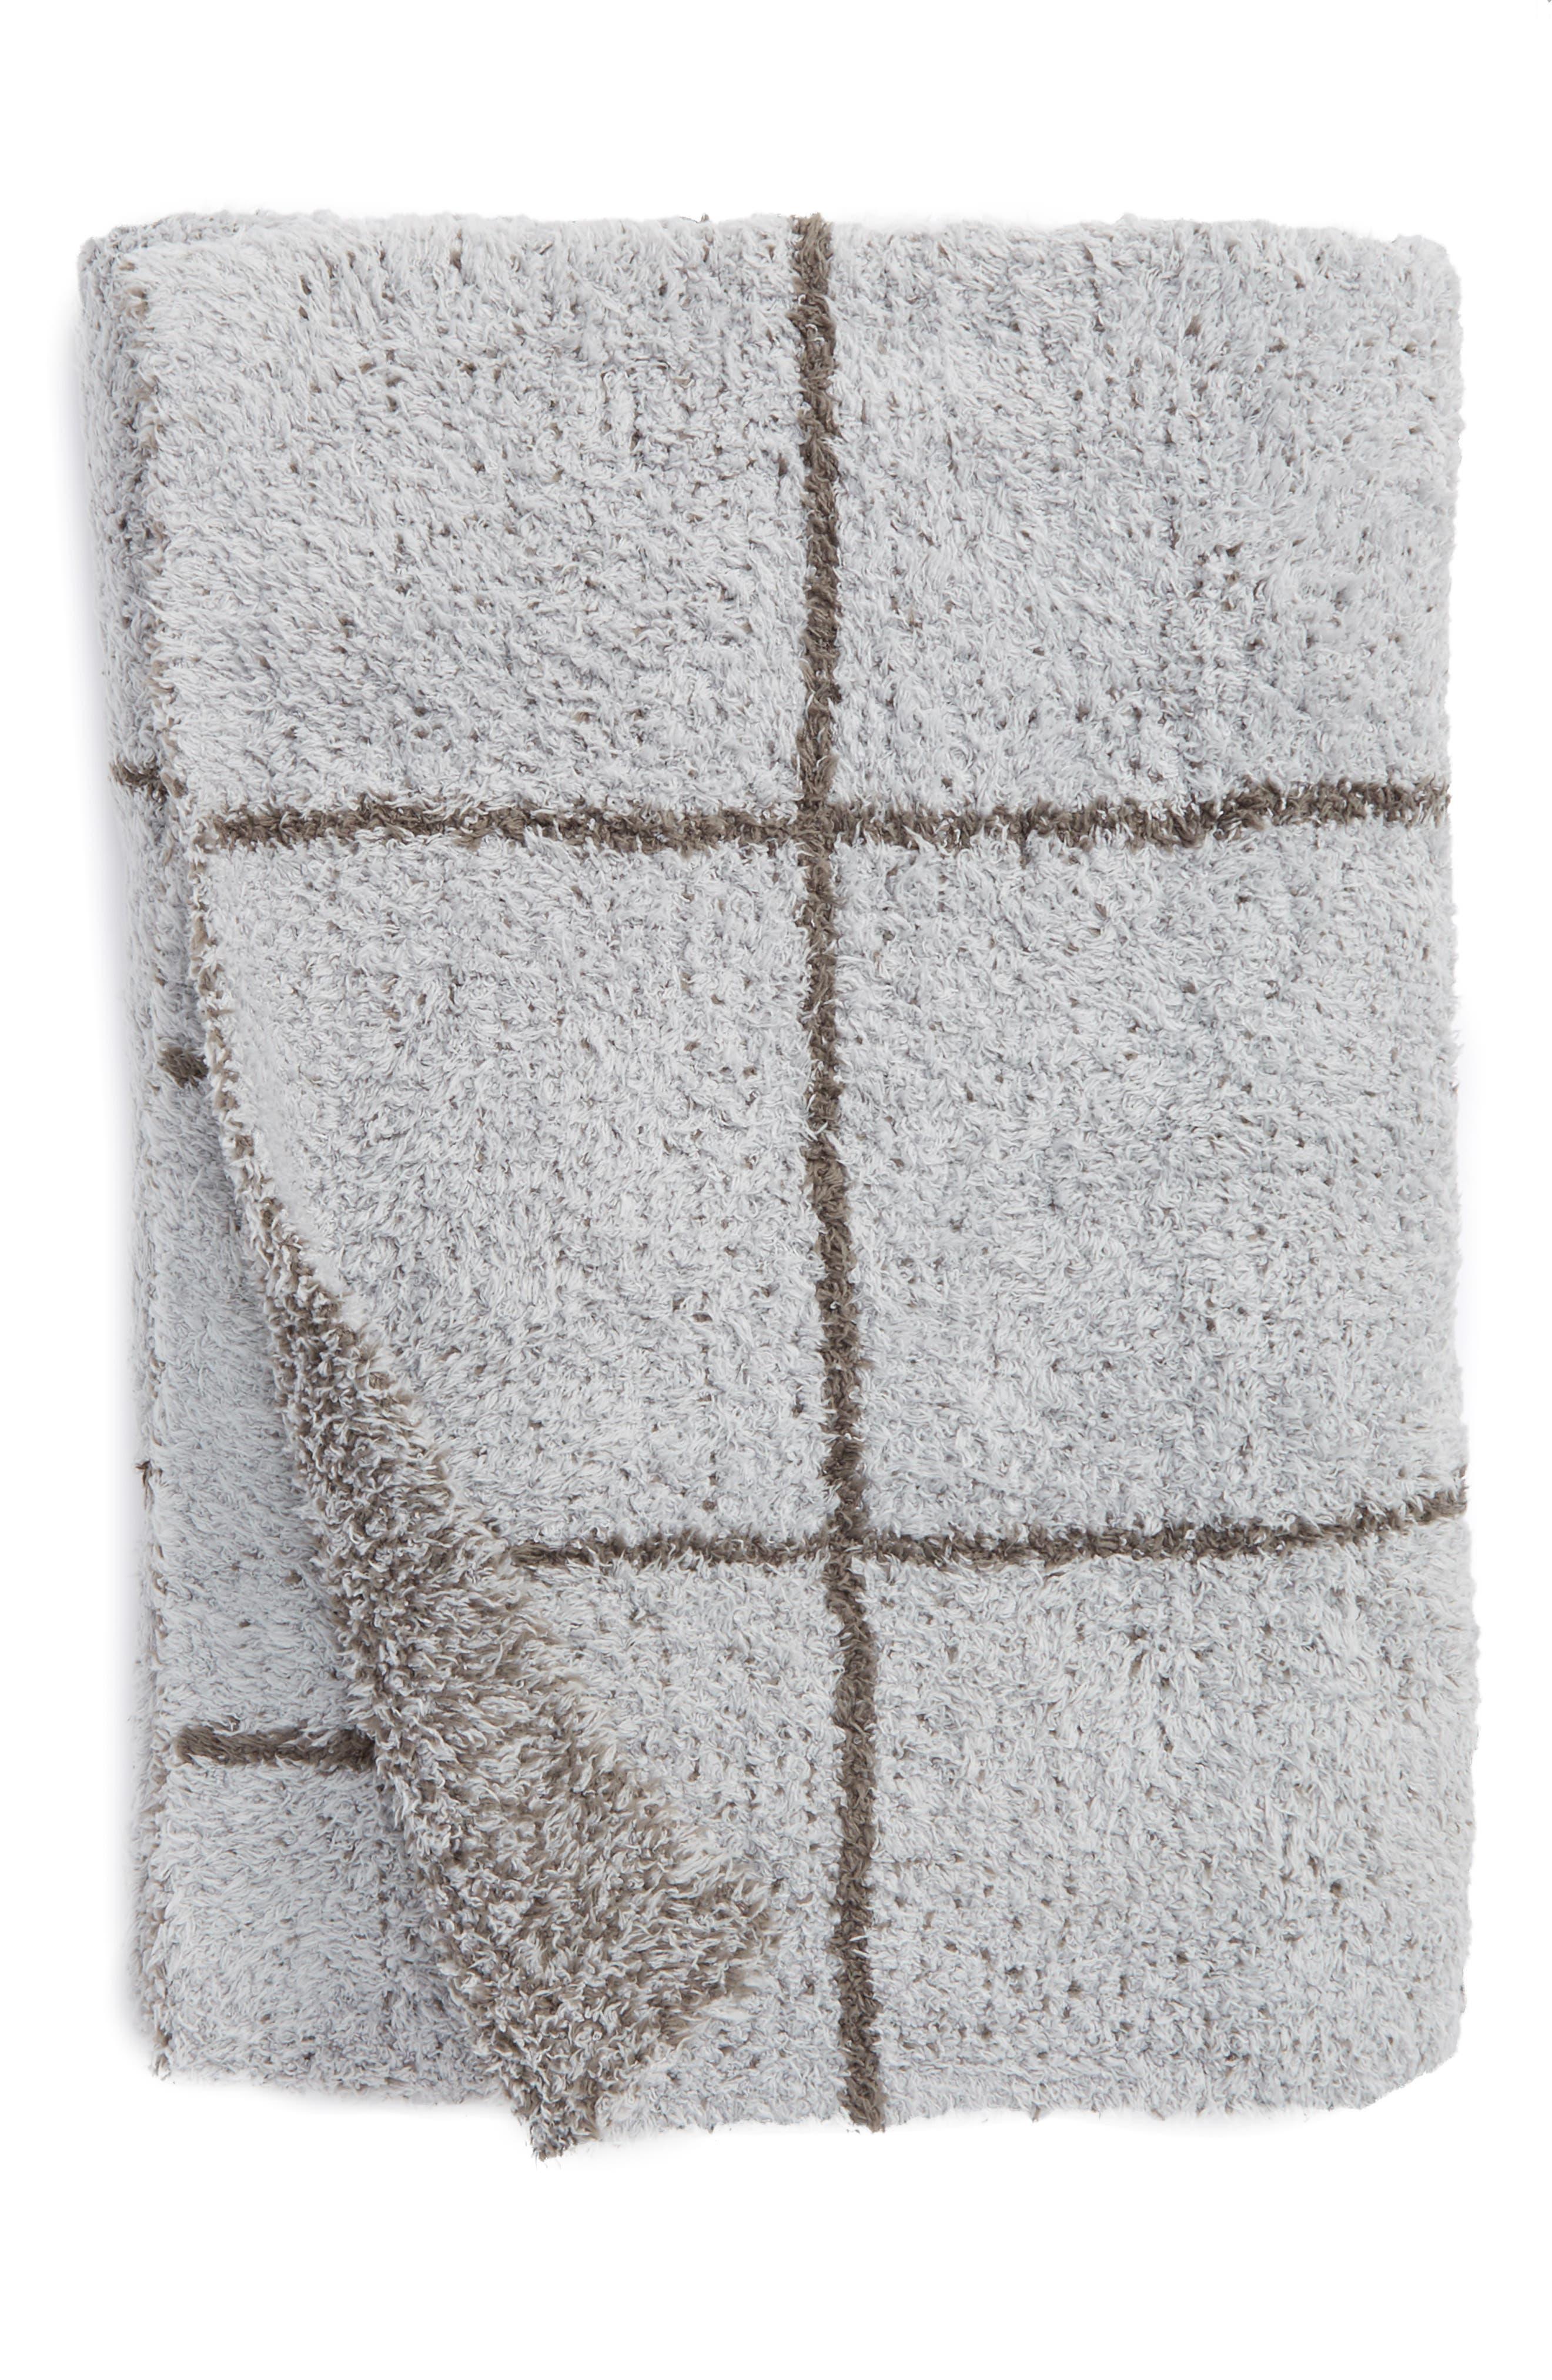 Cozychic<sup>®</sup> Windowpane Plaid Throw Blanket,                             Main thumbnail 1, color,                             Ocean/ Charcoal